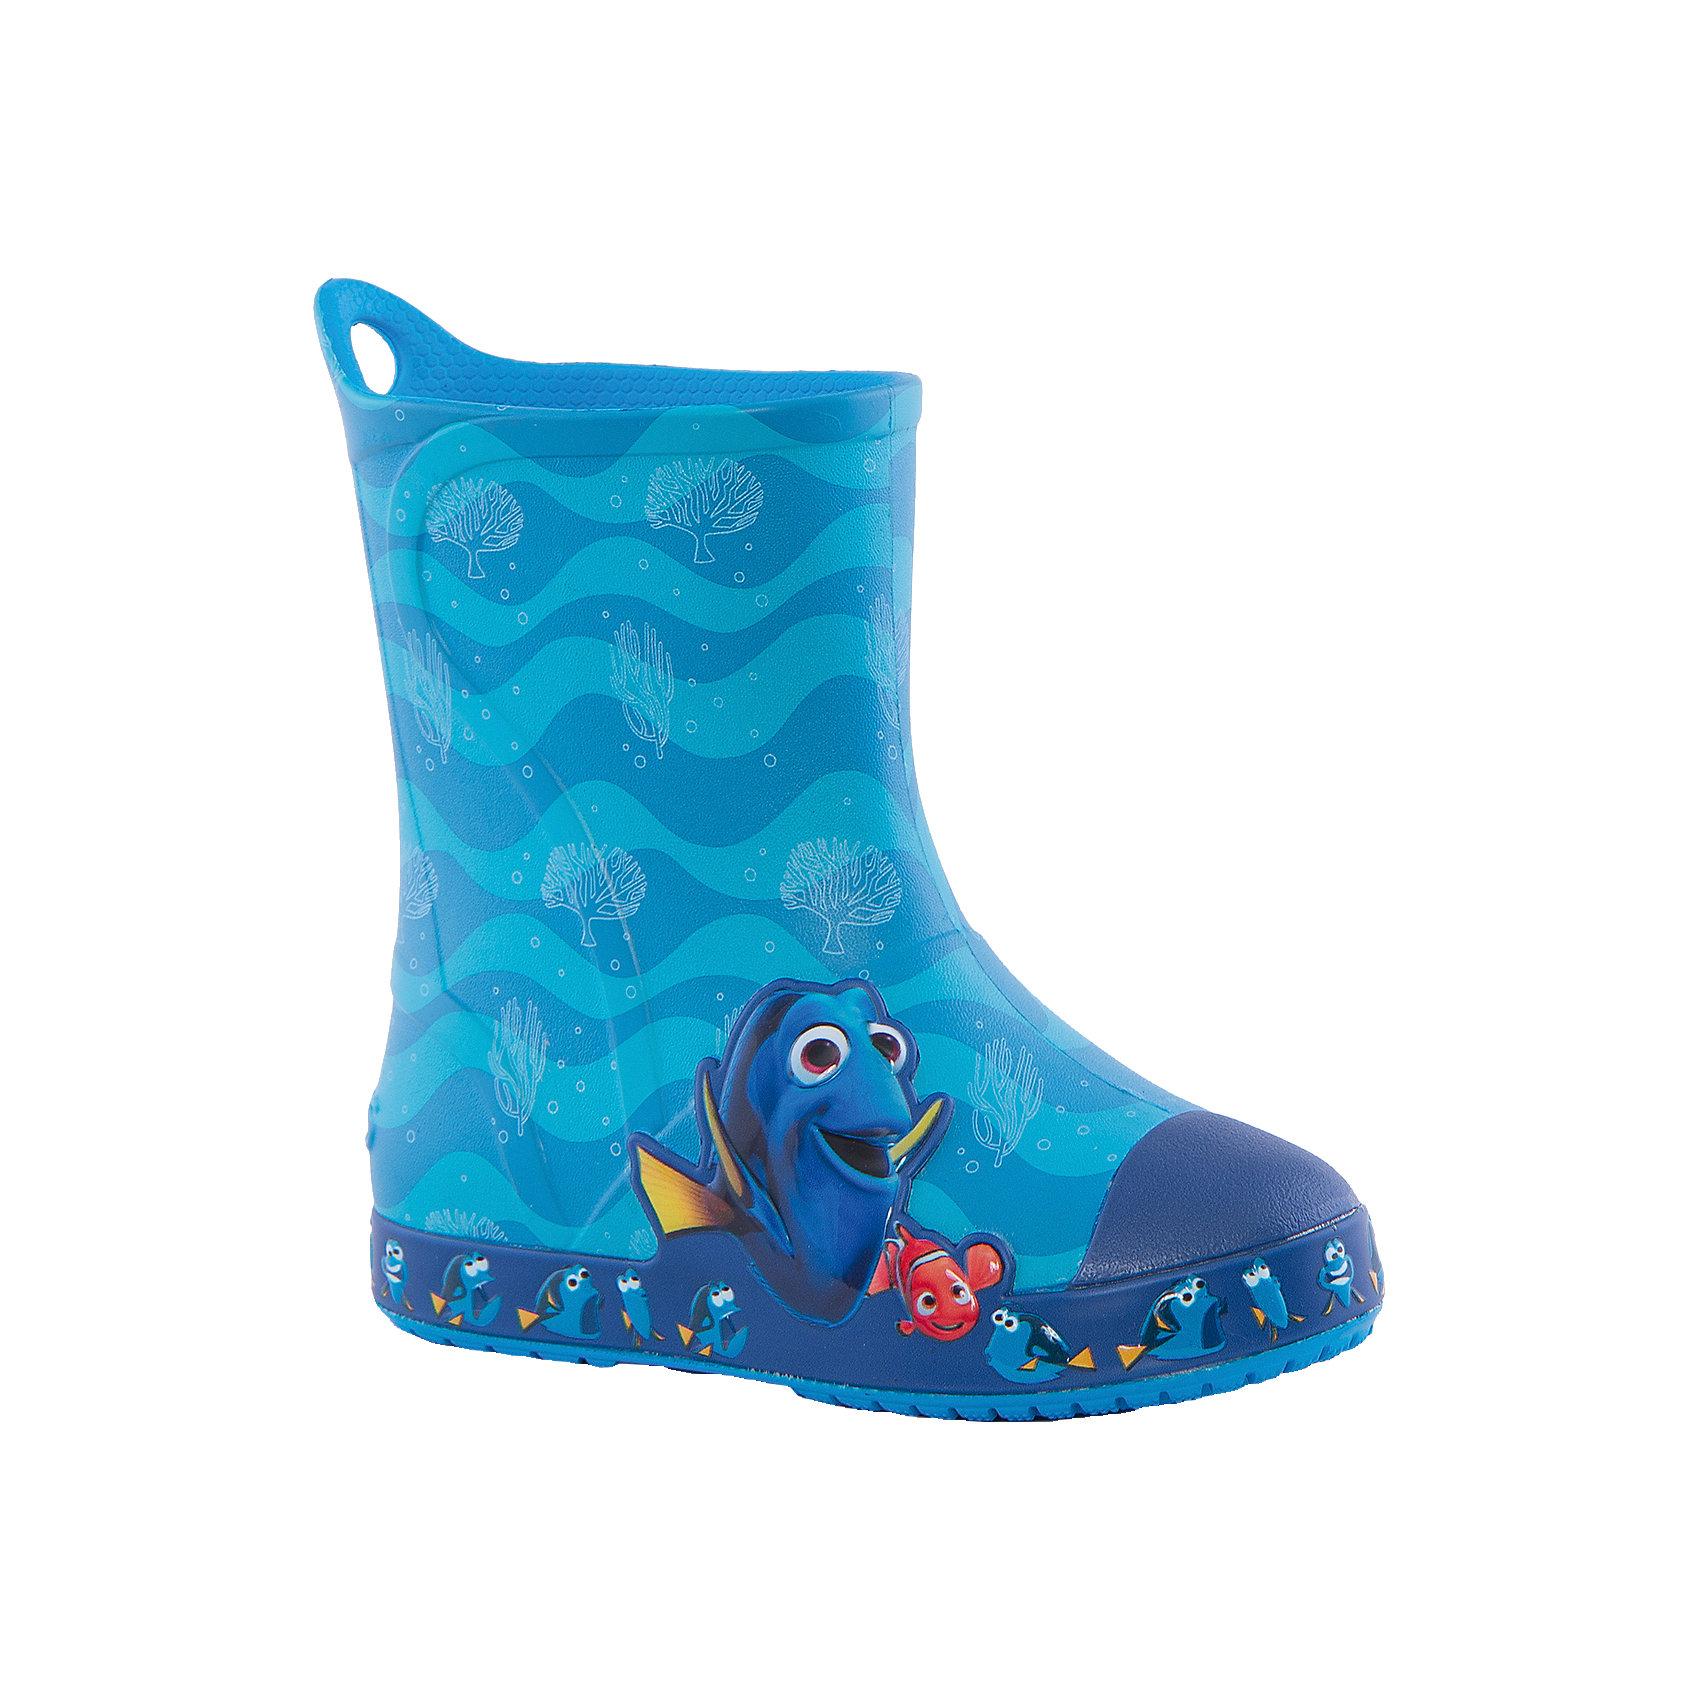 crocs Резиновые сапоги Crocs sparkz юбка до колена